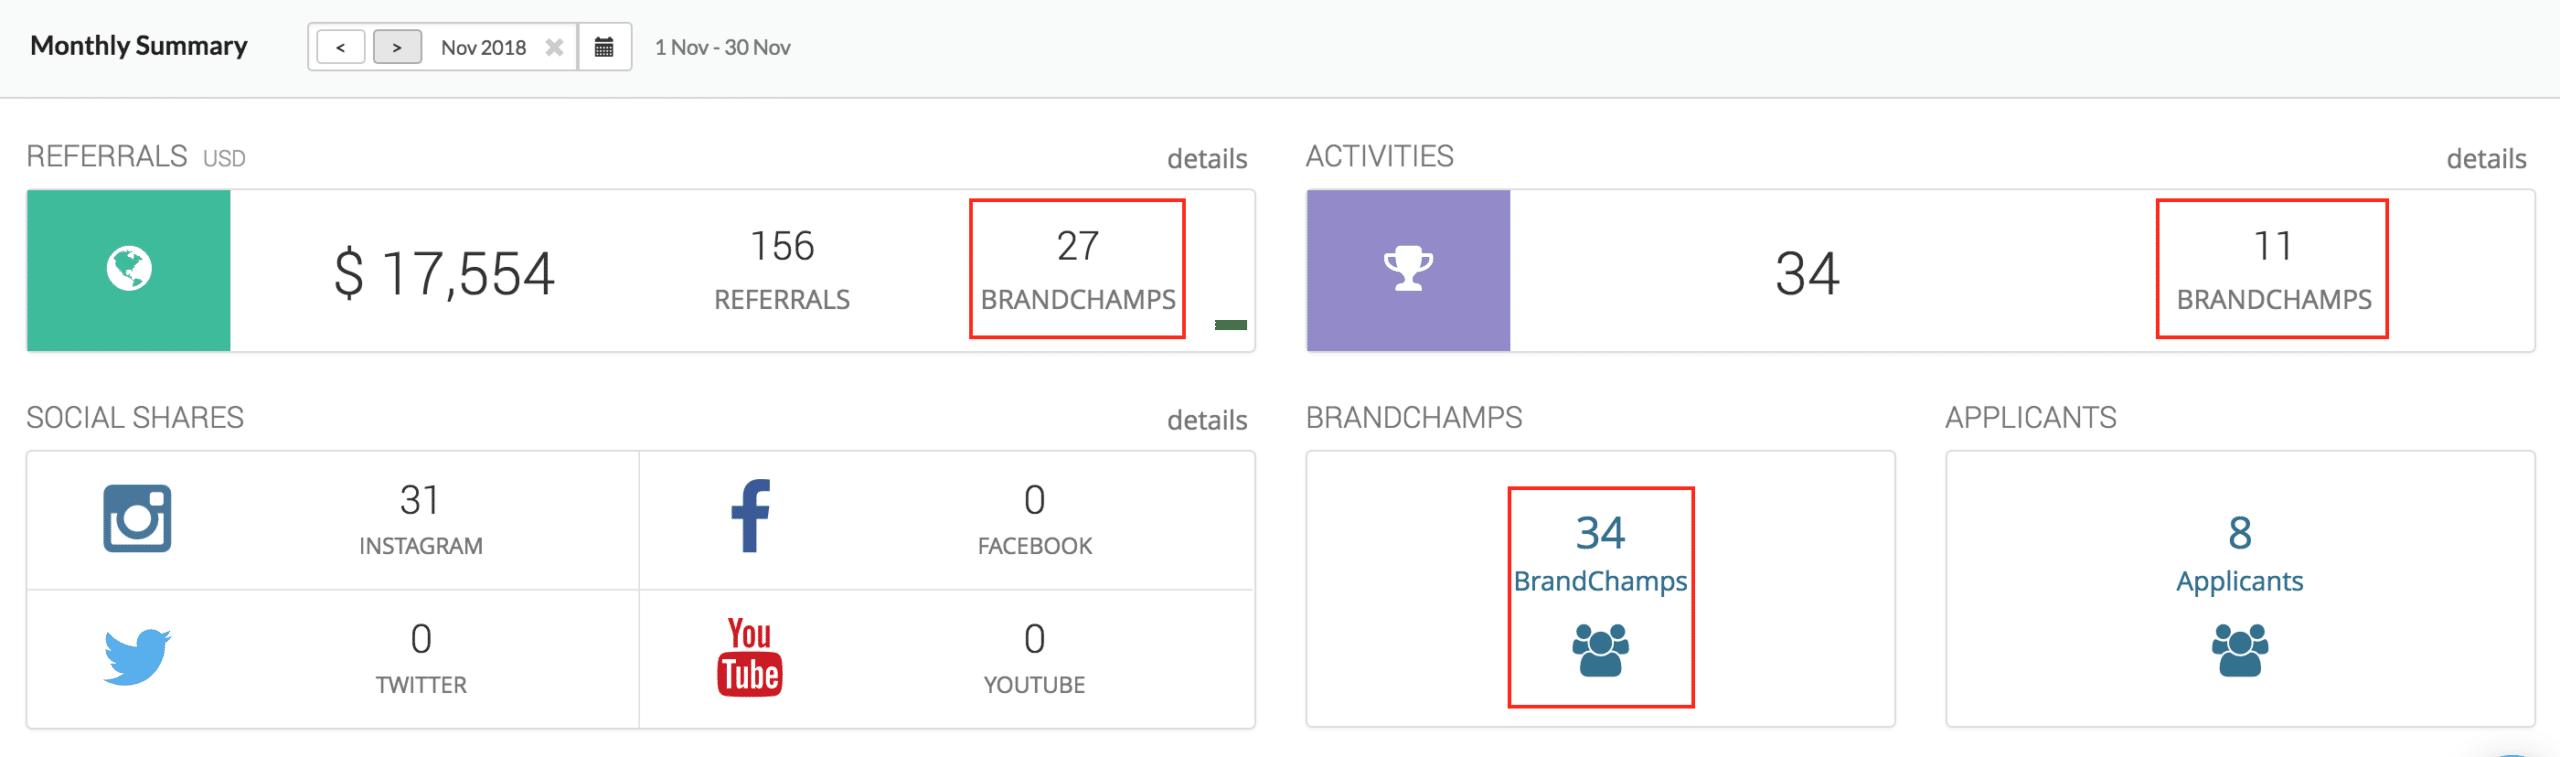 BrandChamp ambassador software analytics monthly summary